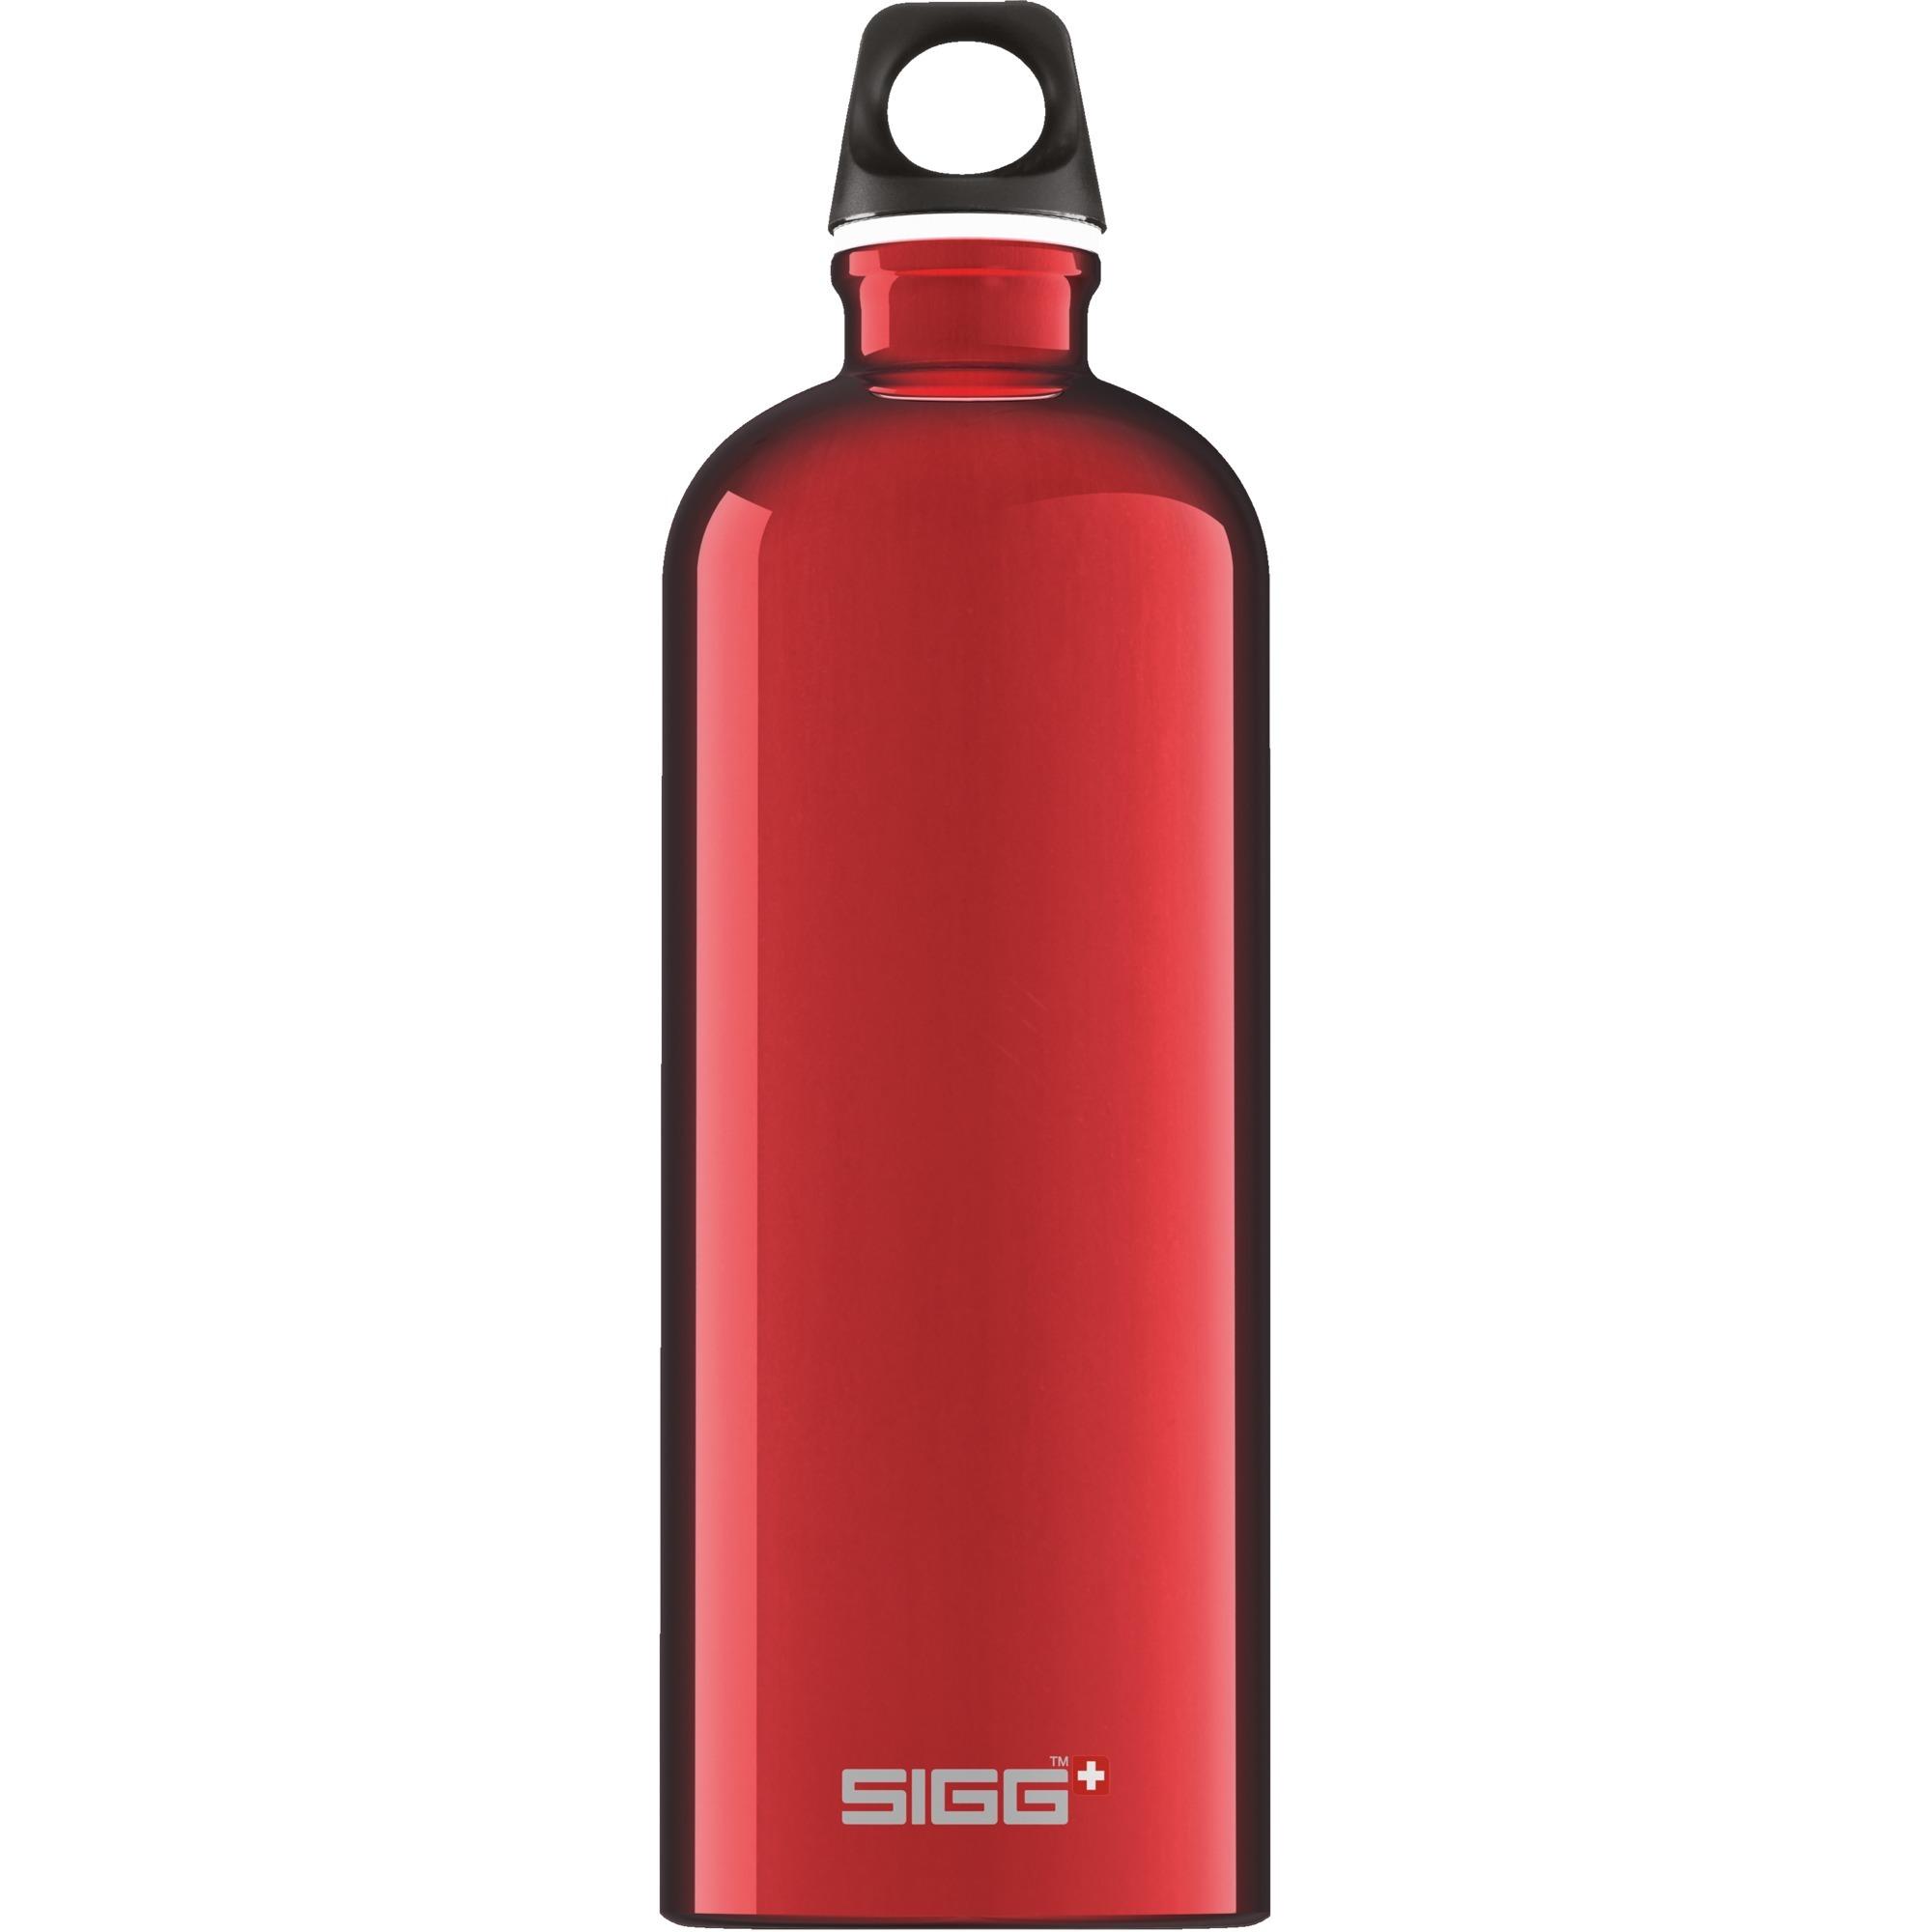 1.0 L Traveller bidón de agua 1000 ml Rojo, Botella de agua